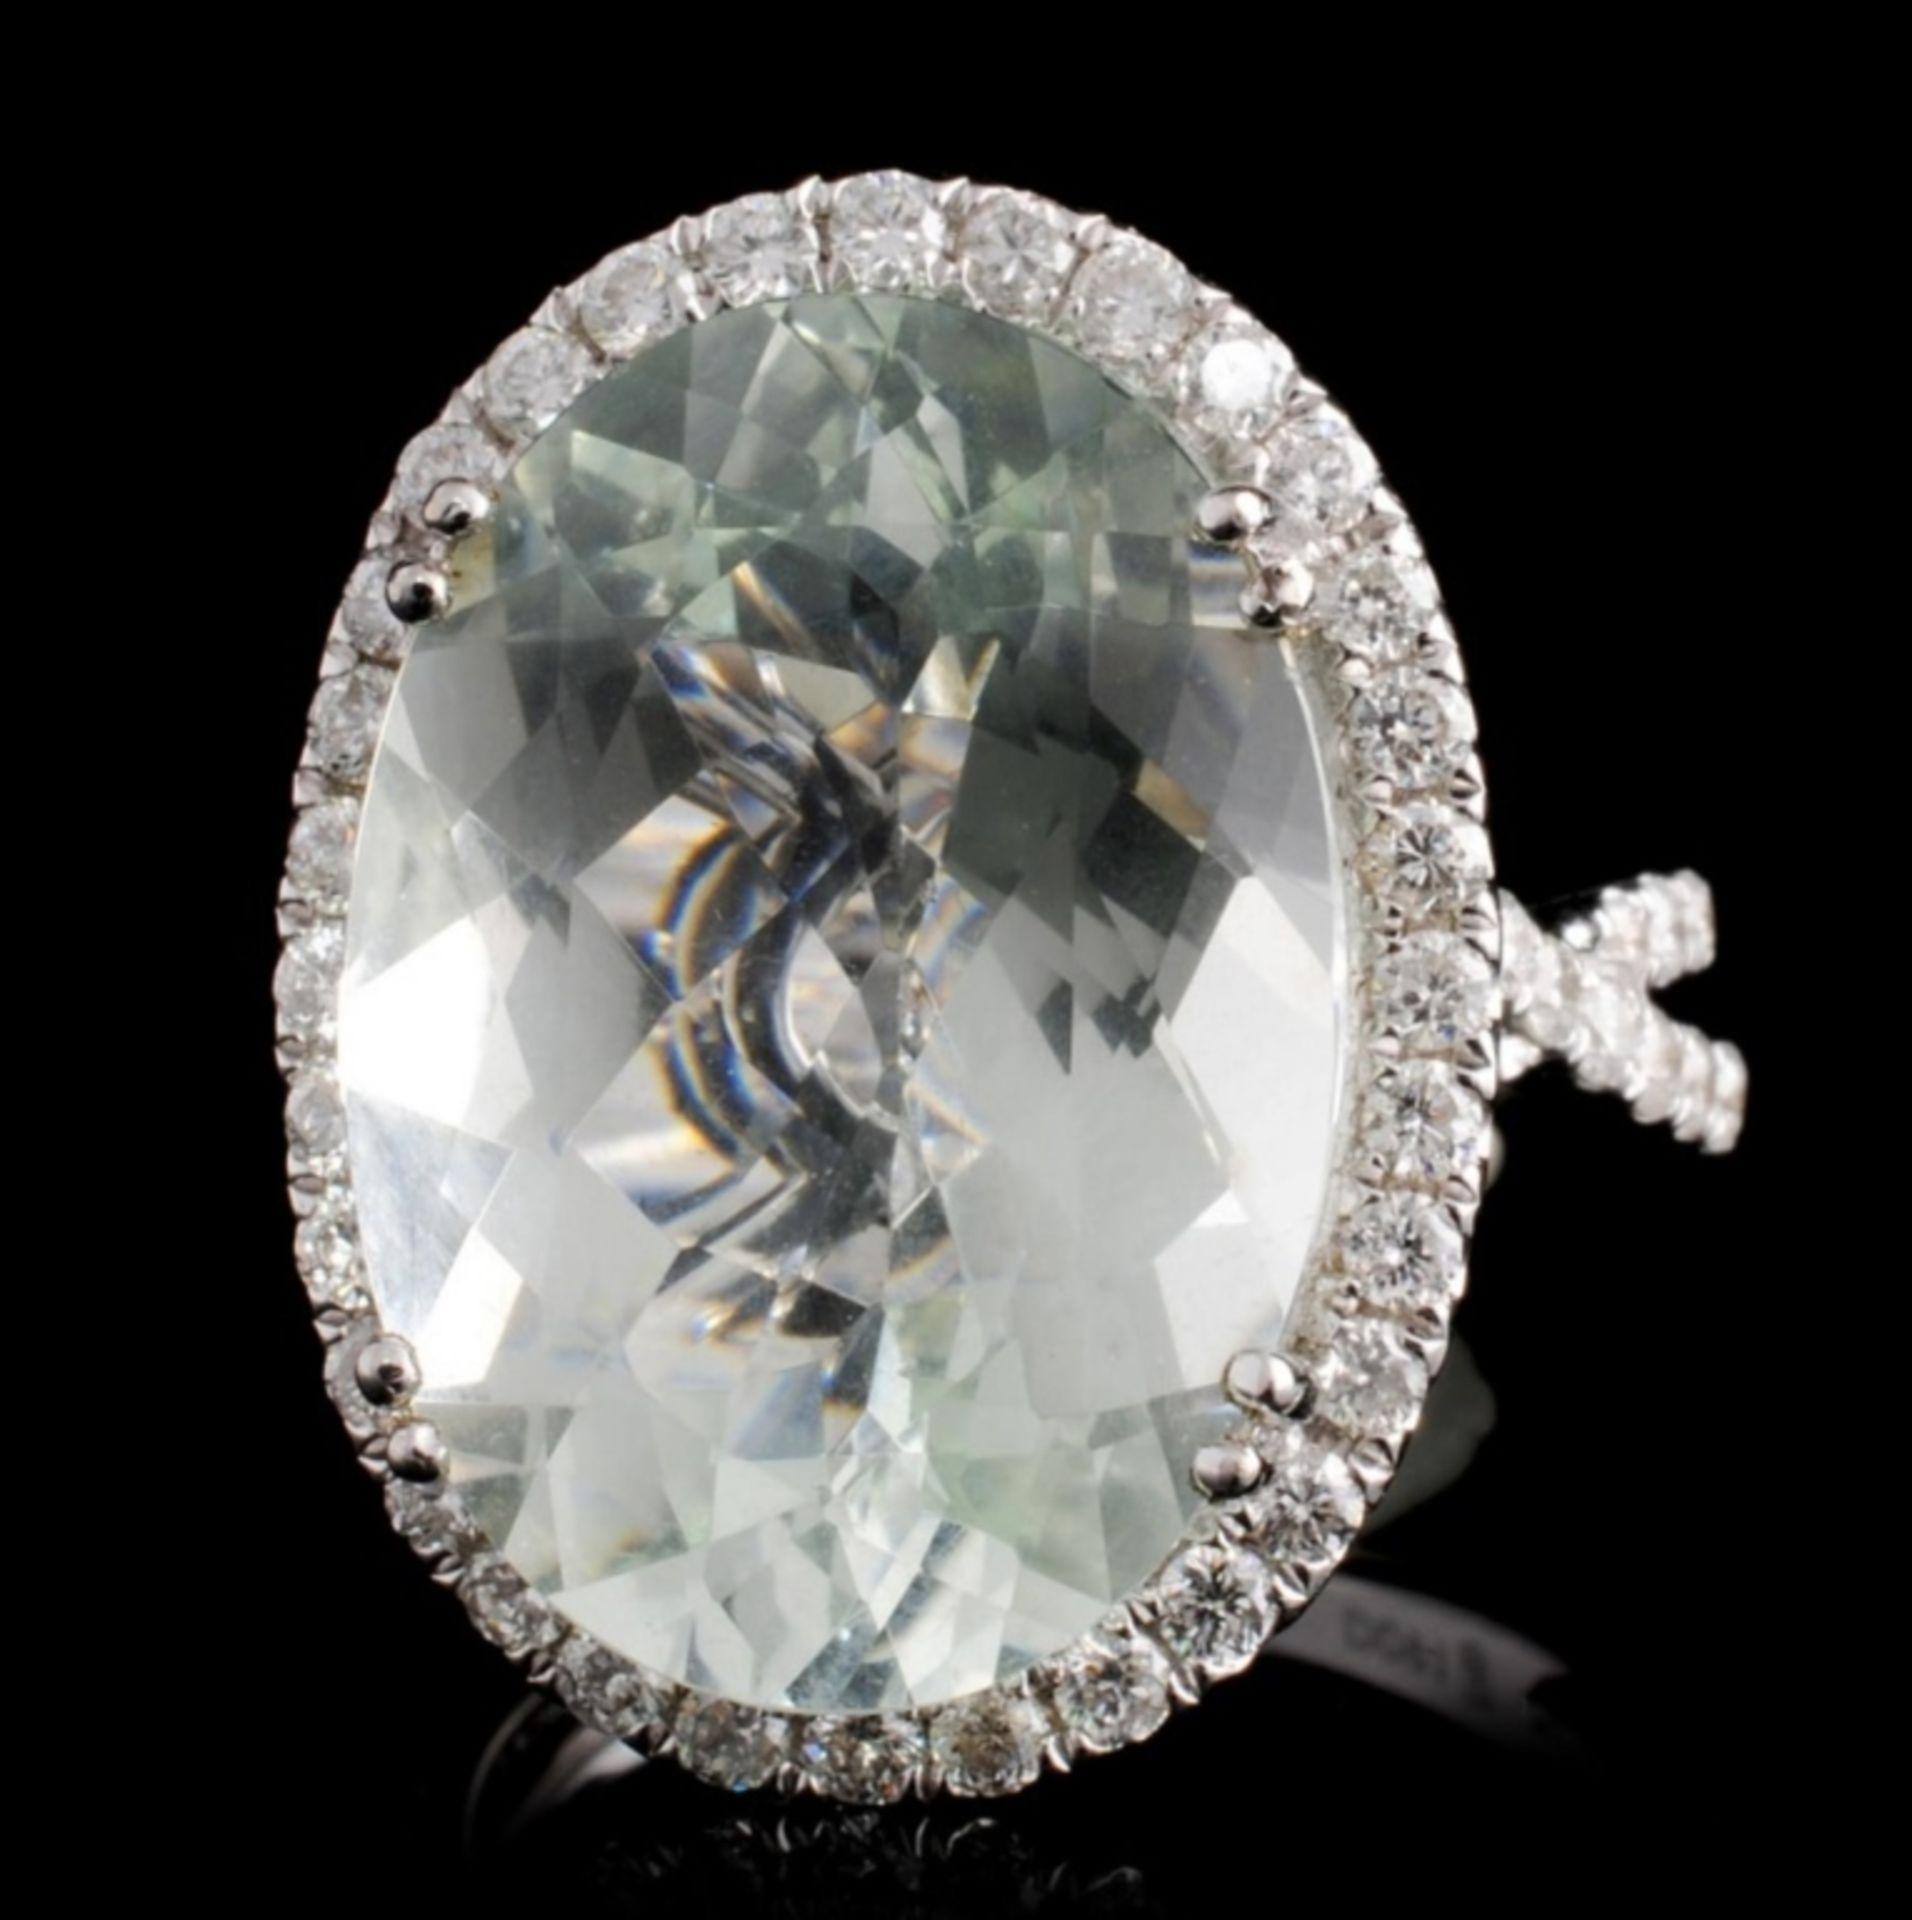 18K Gold 10.00ct Aquamarine & 0.91ct Diamond Ring - Image 2 of 4